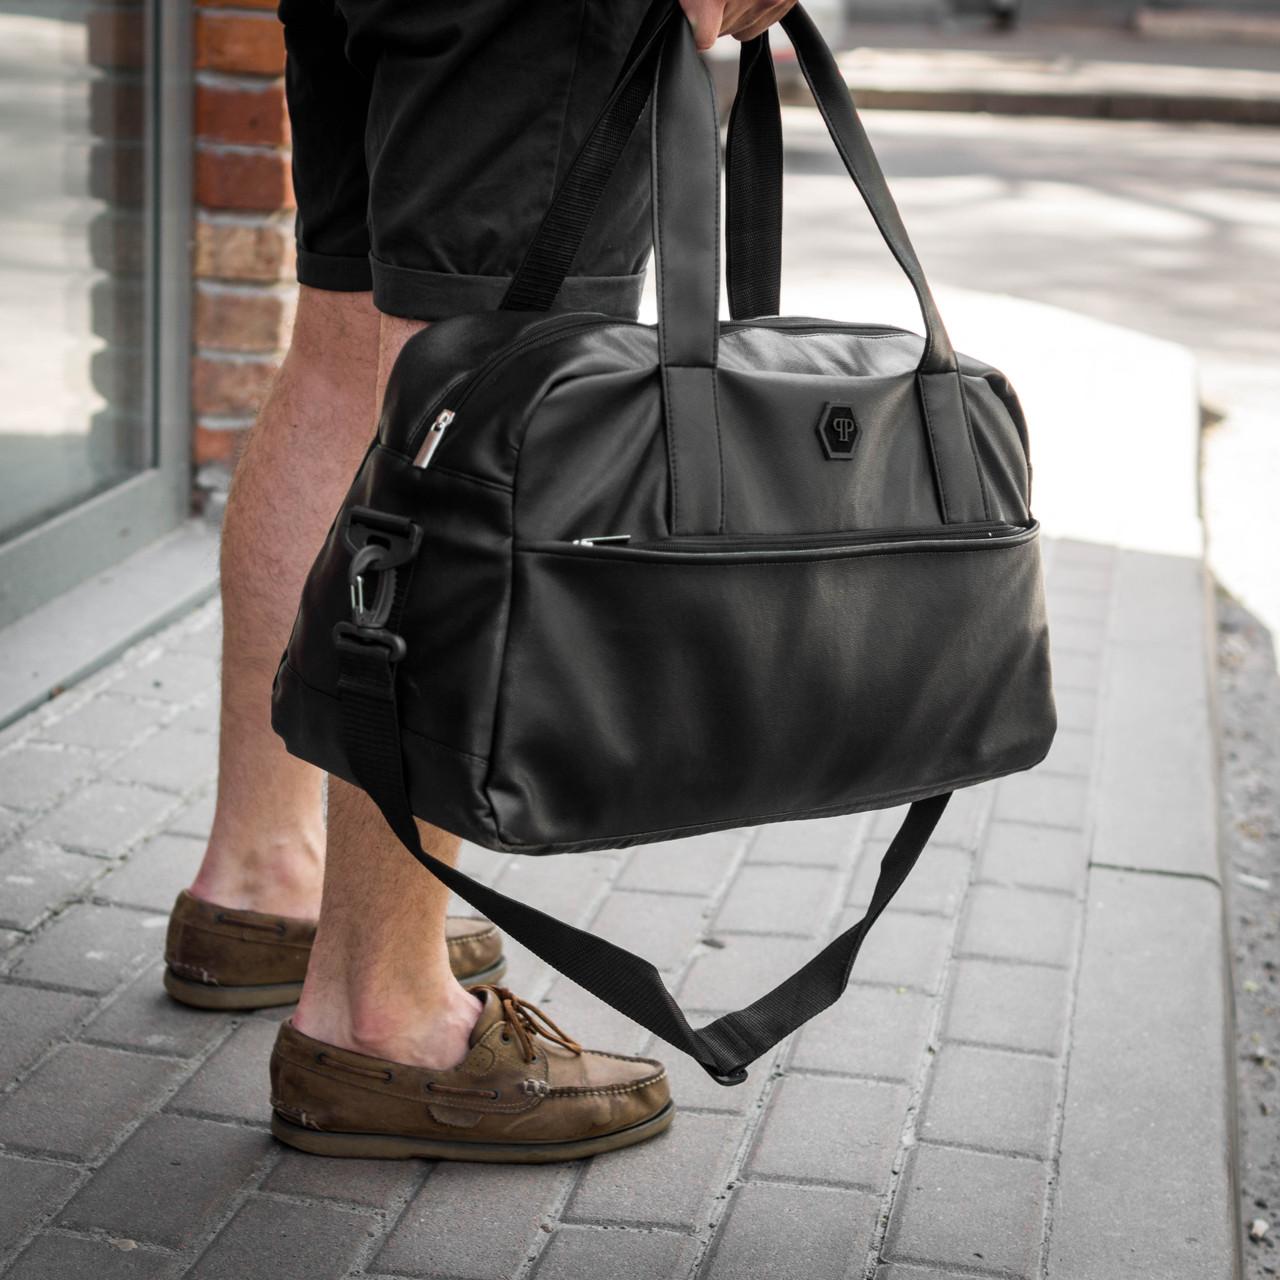 242ec9e33724 Сумка кожаная Philipp Plein Ghost дорожная мужская сумка из кожи.